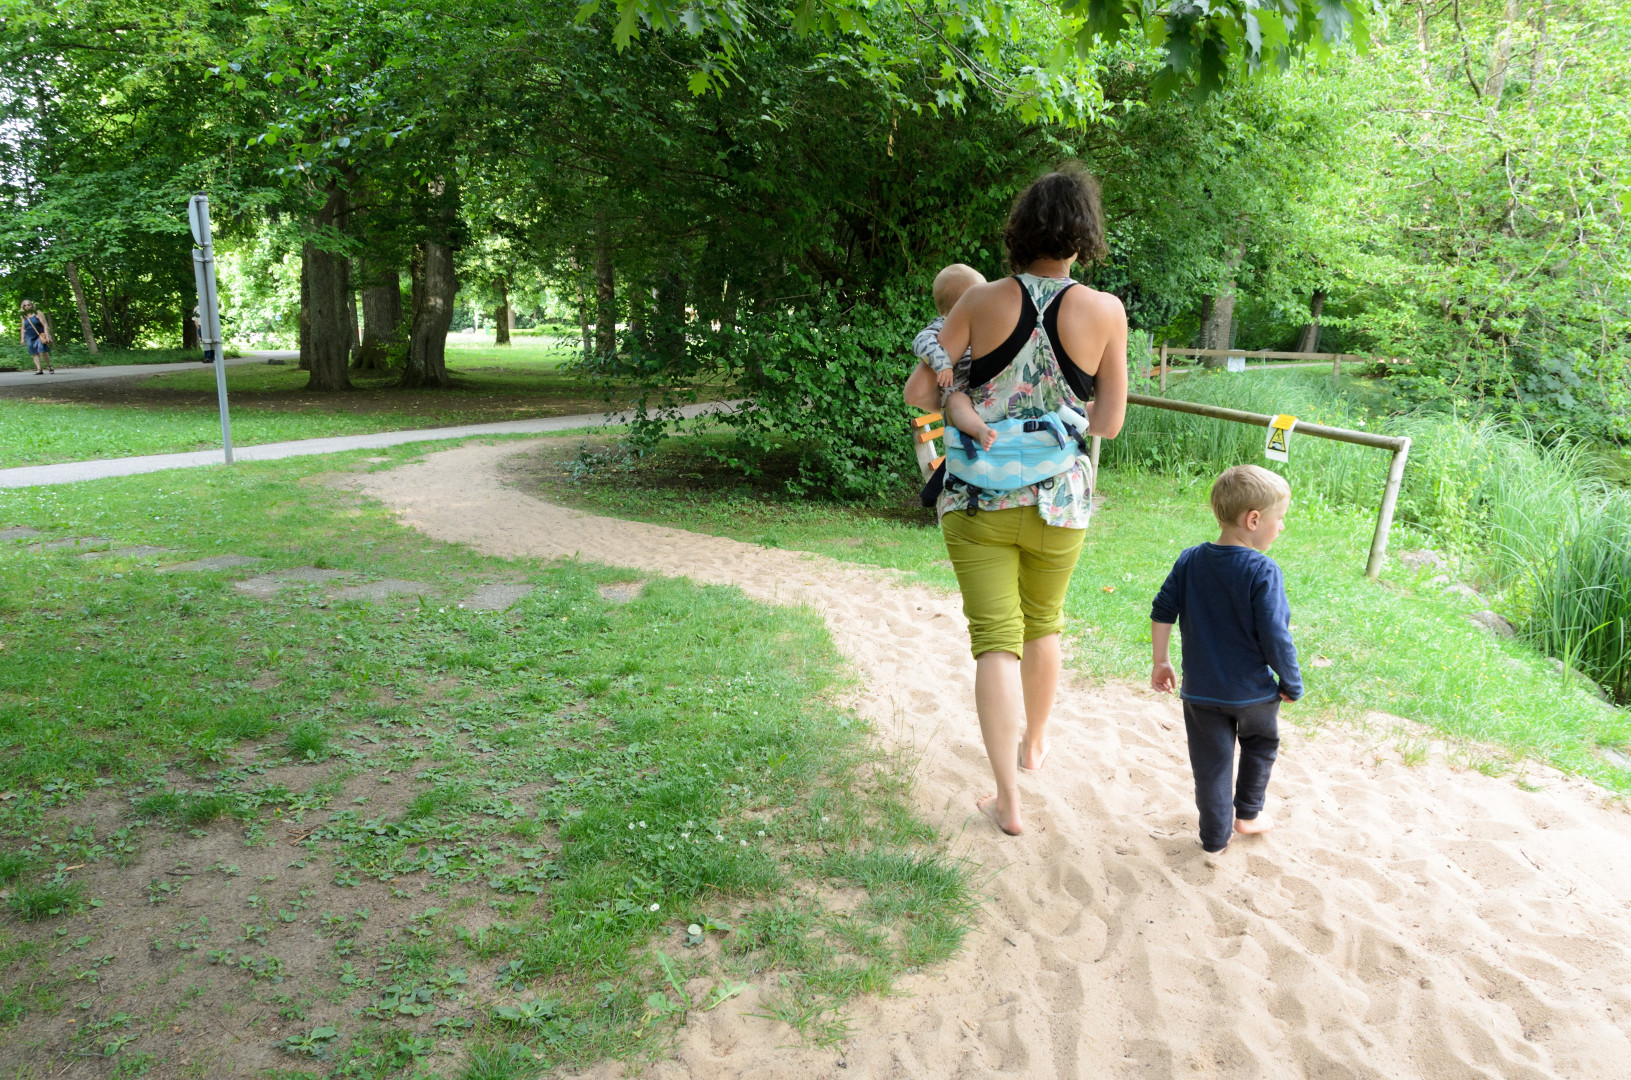 Matka s dvomi deťmi na barefoot chodníku kráča naboso po piesku